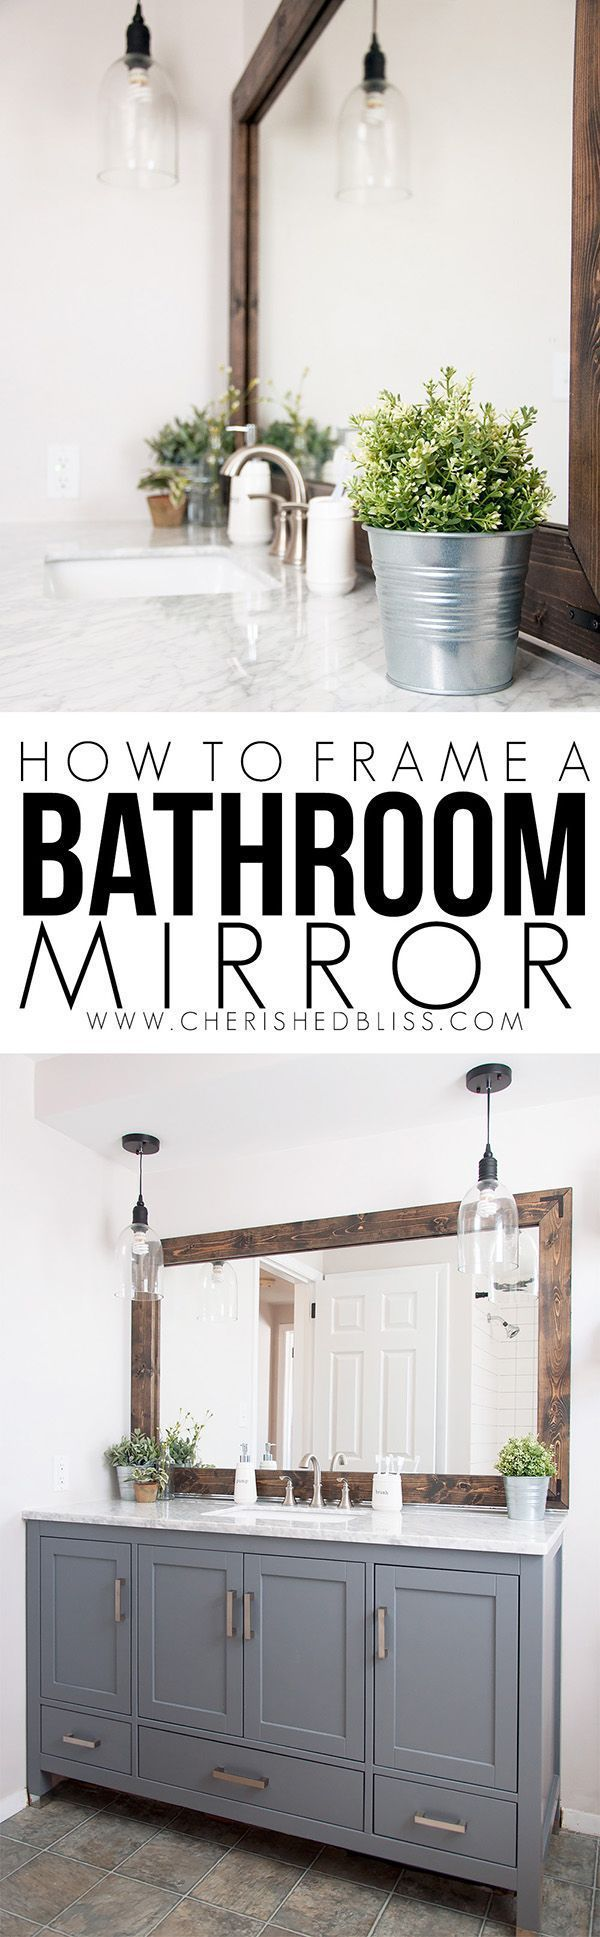 2115 best INSPIRATION: Home Improvement images on Pinterest ...